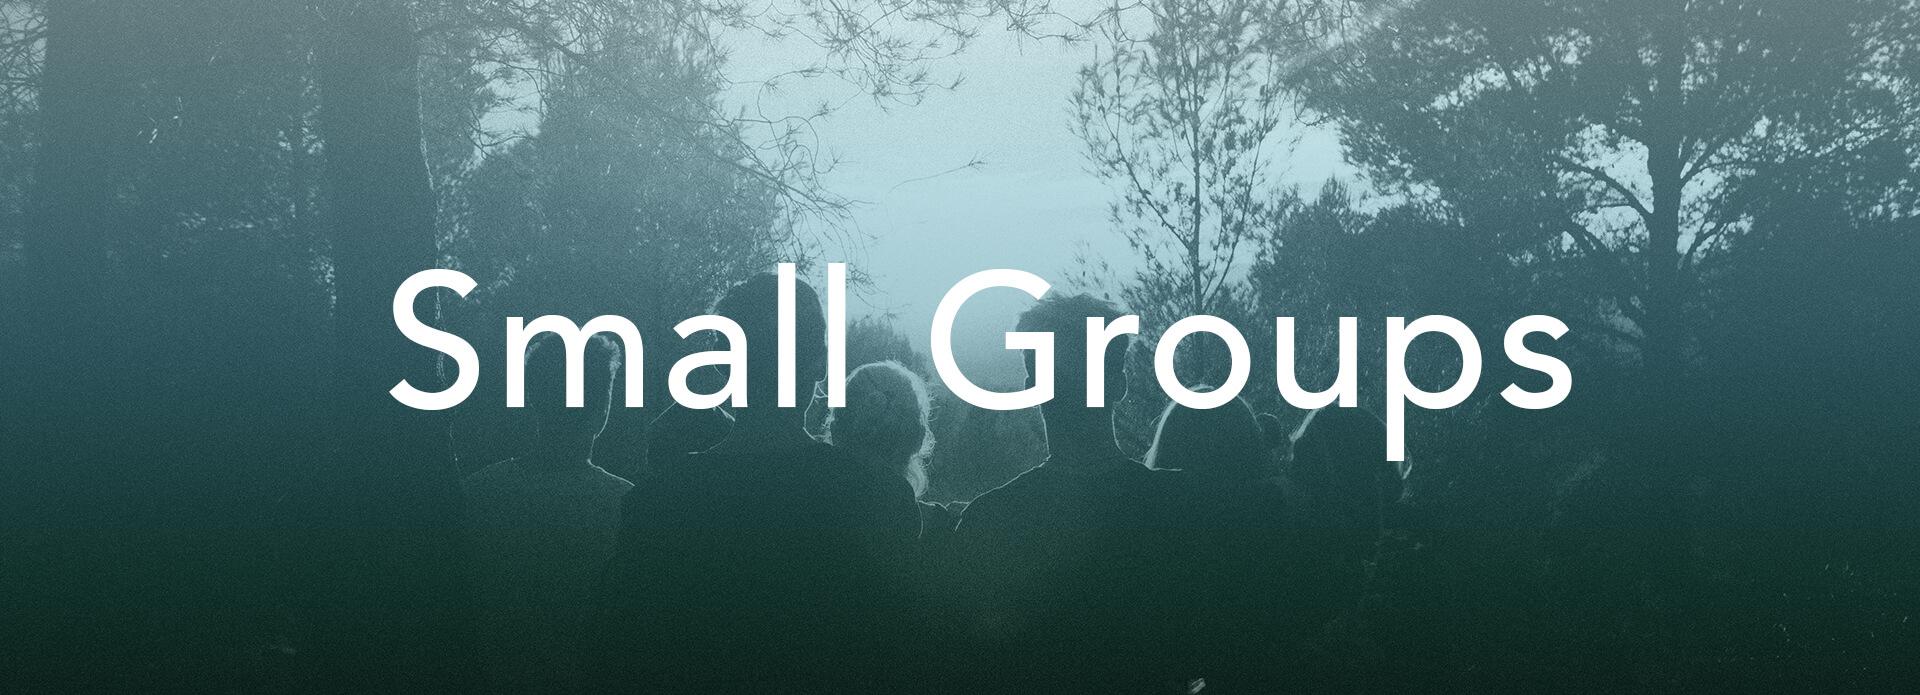 smallgroupspage